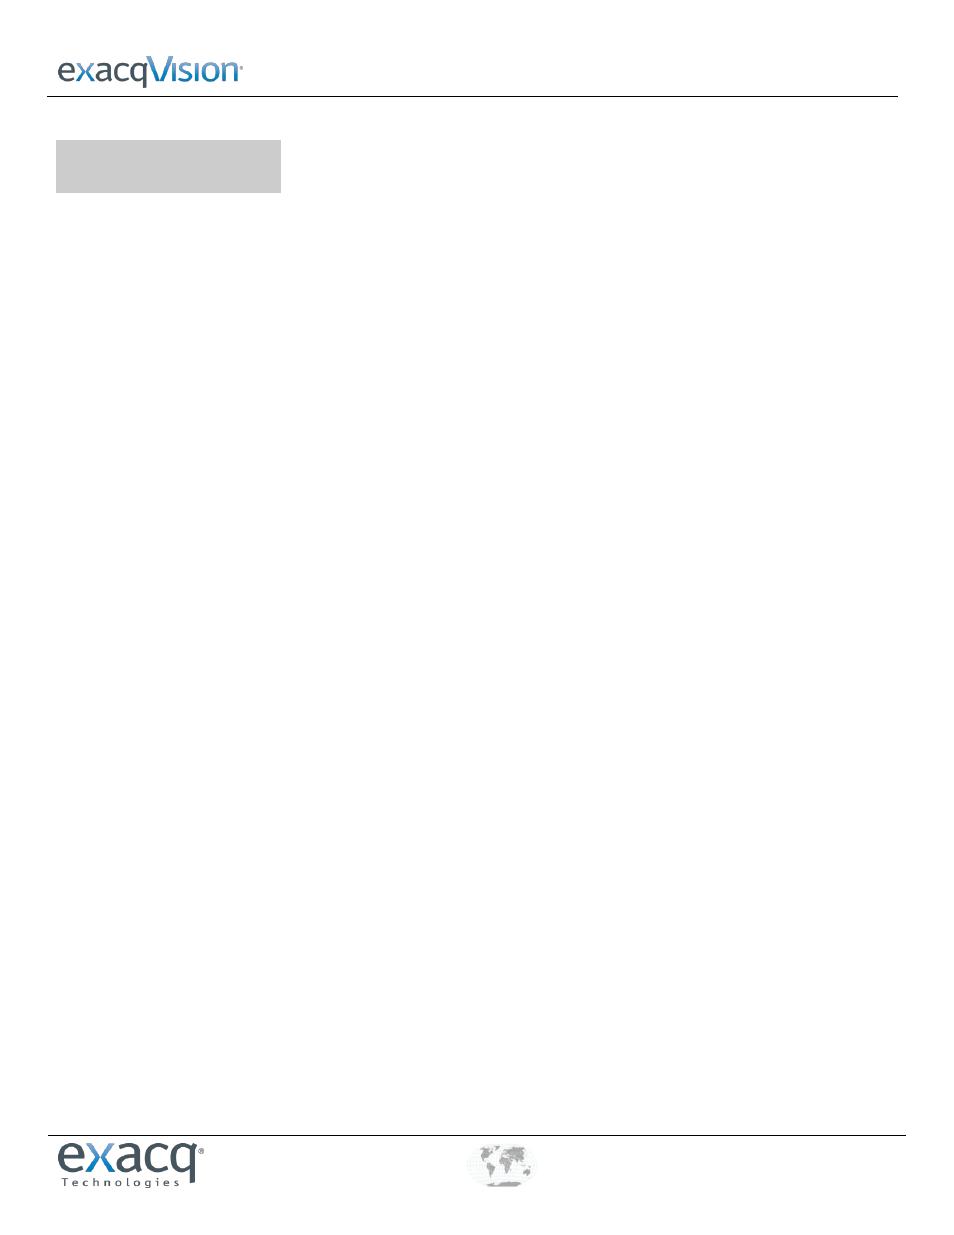 Exacq exacqVision Server/Client OS: Linux OpenLDAP User